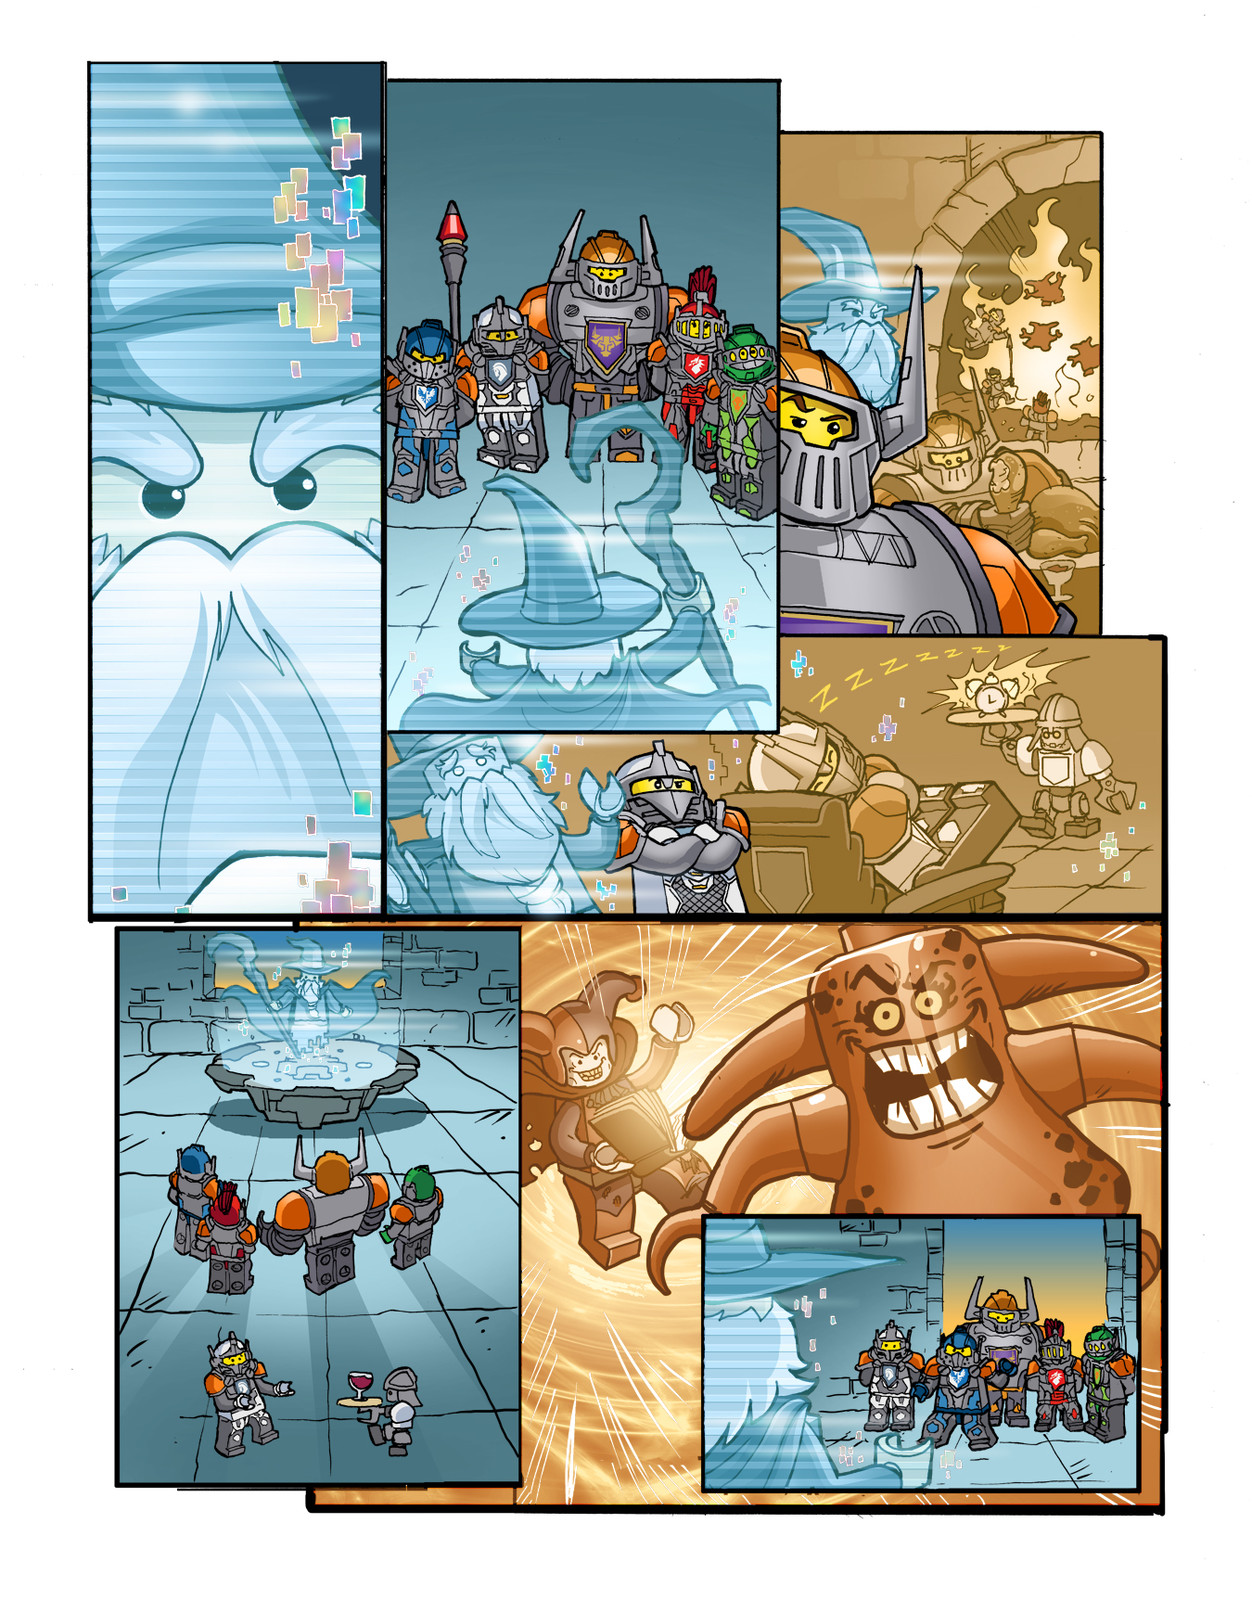 LEGO NEXO KNIGHTS, page 1